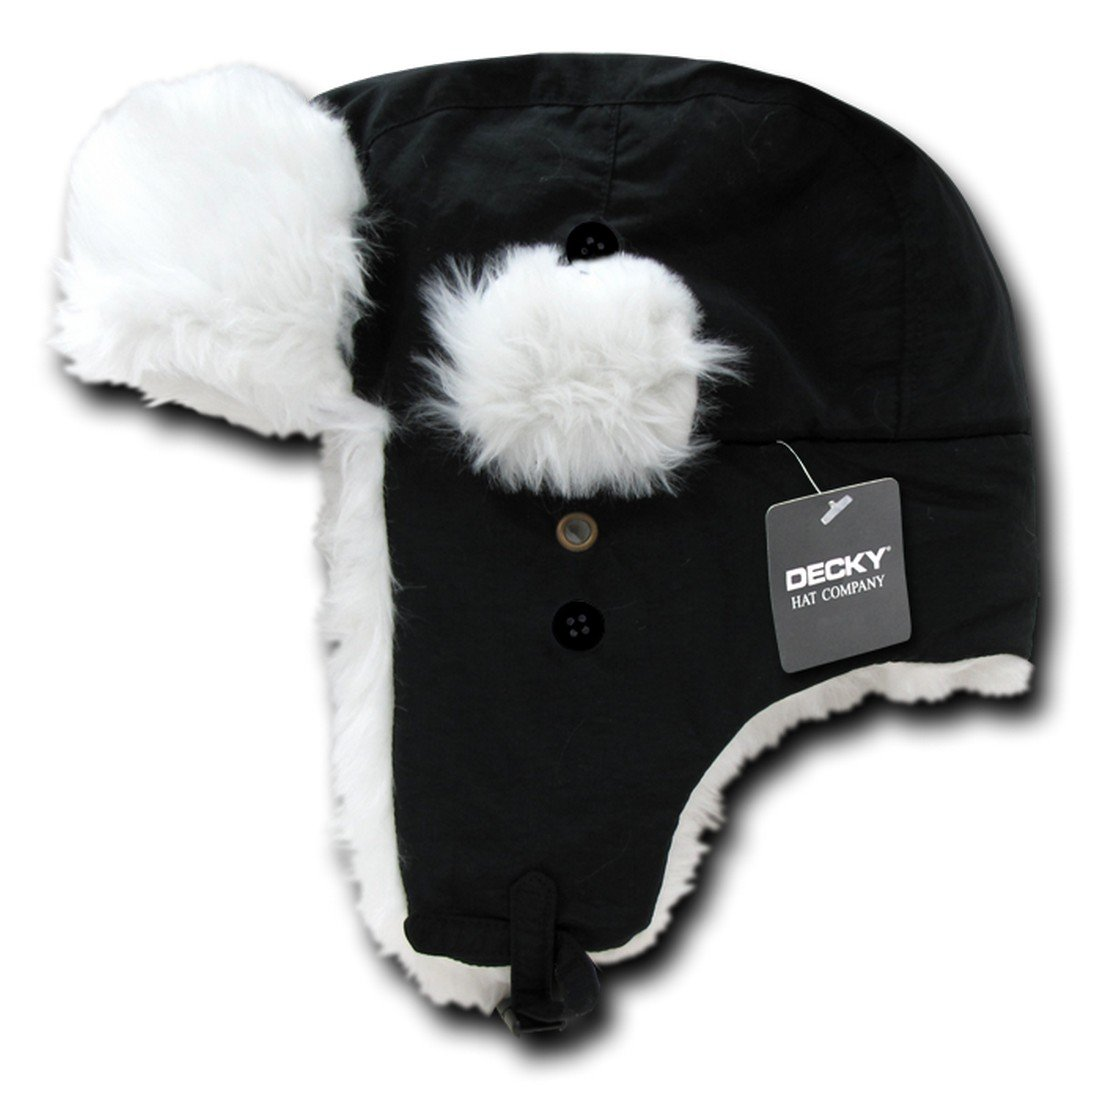 Decky Inc Faux Fur Lined Aviator Pilot Helmet Style Beanie Skull Hat 777